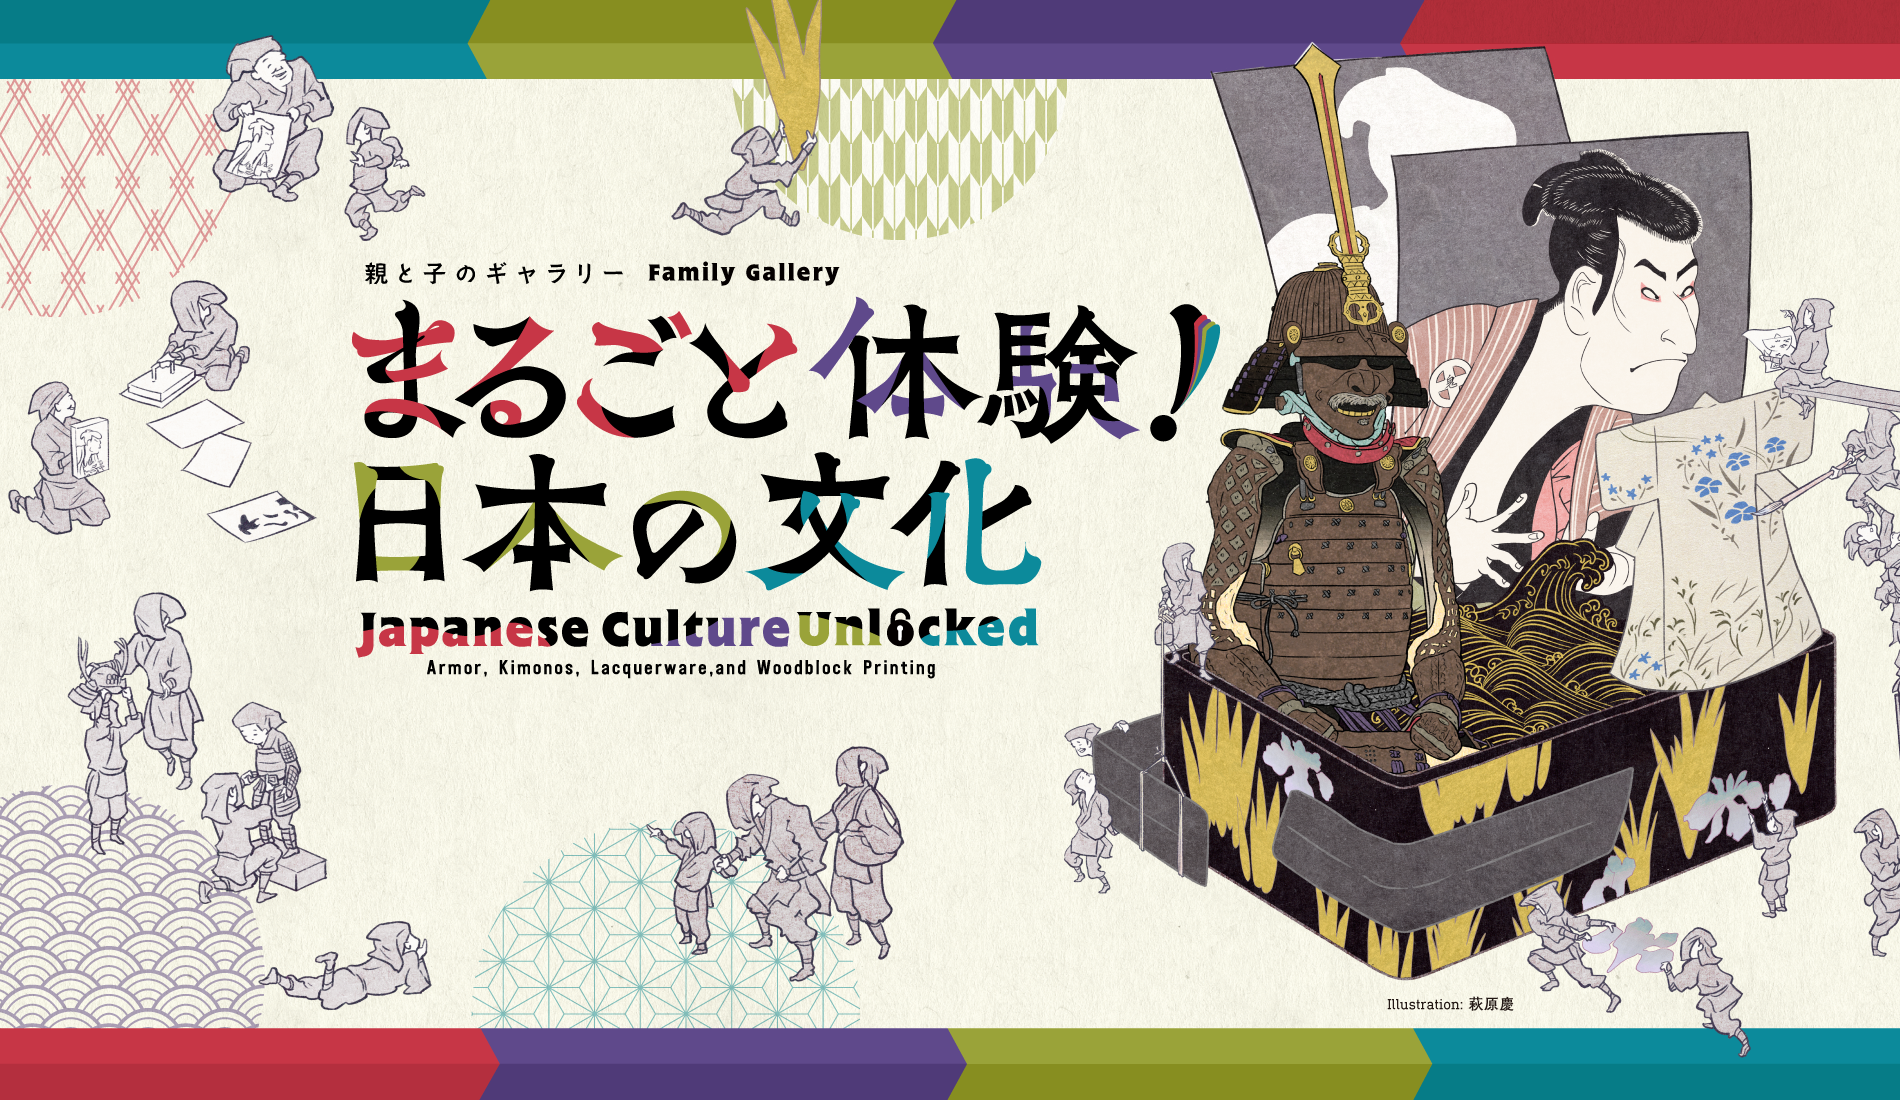 Japanese Culture Unlocked: Armor, Kimonos, Lacquerware, and Woodblock Printing: Main visual